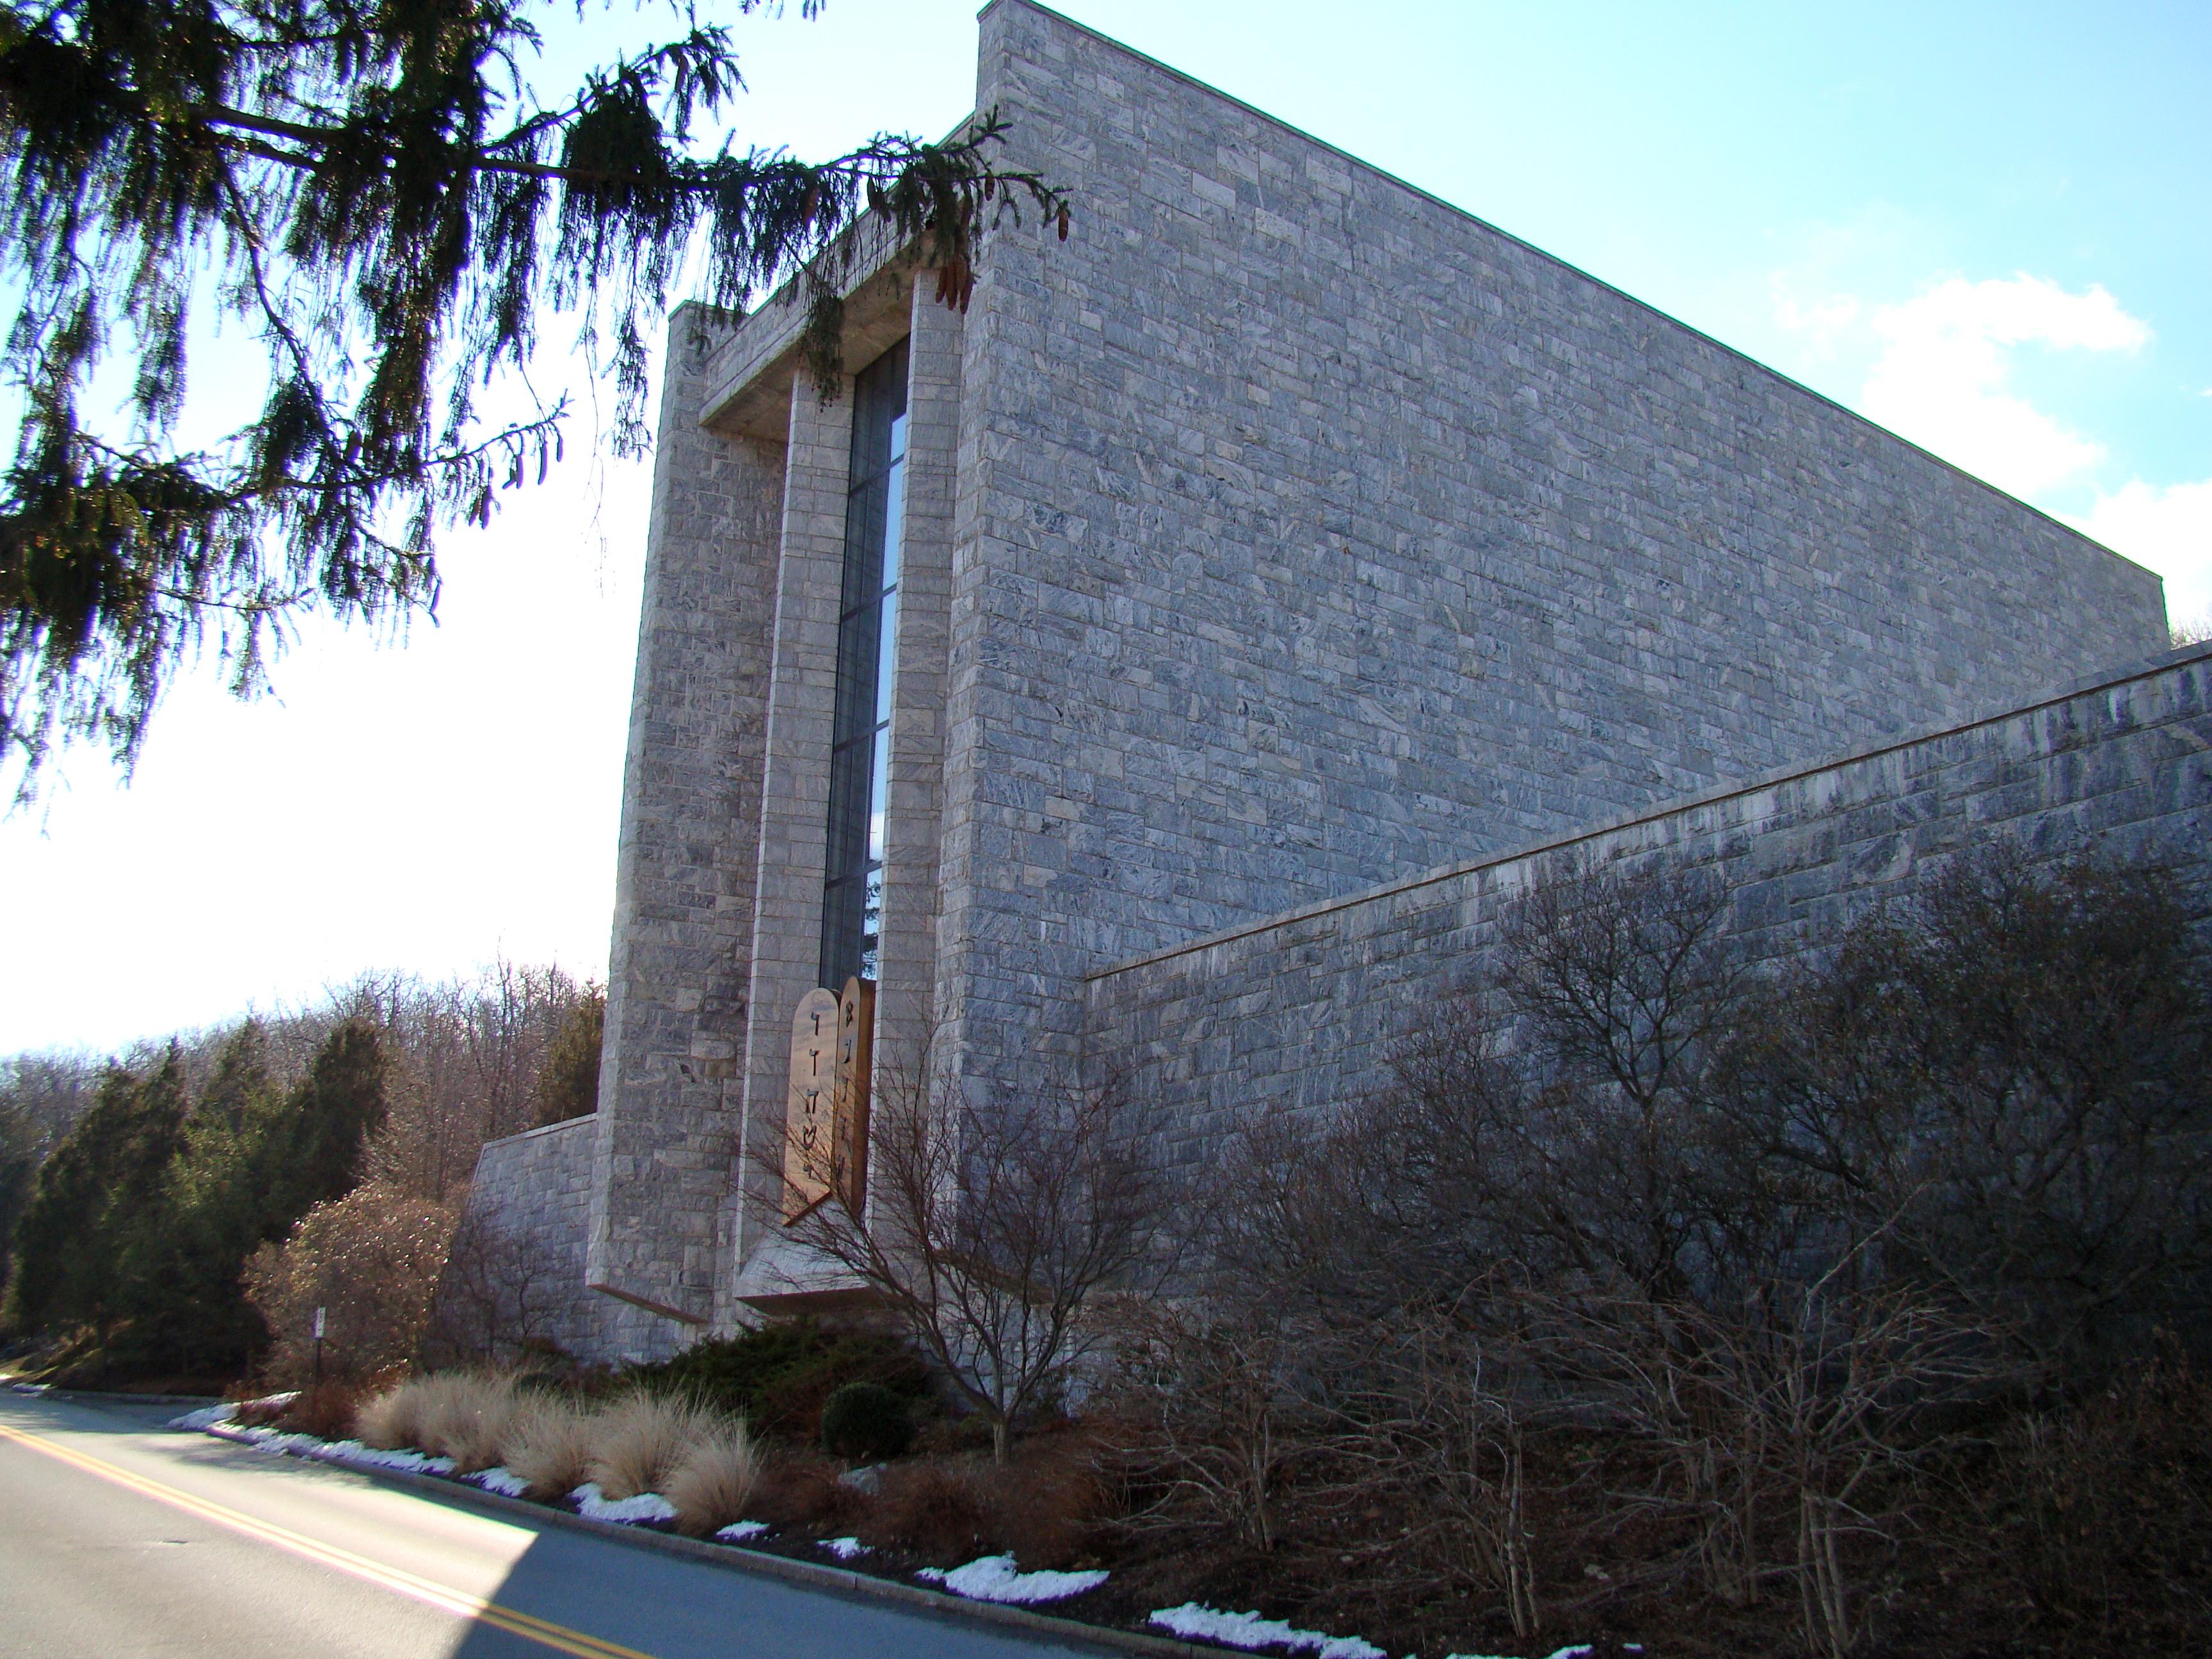 Amazing Details west point Jewish chapel  Lapel Pin Tac Pinm14